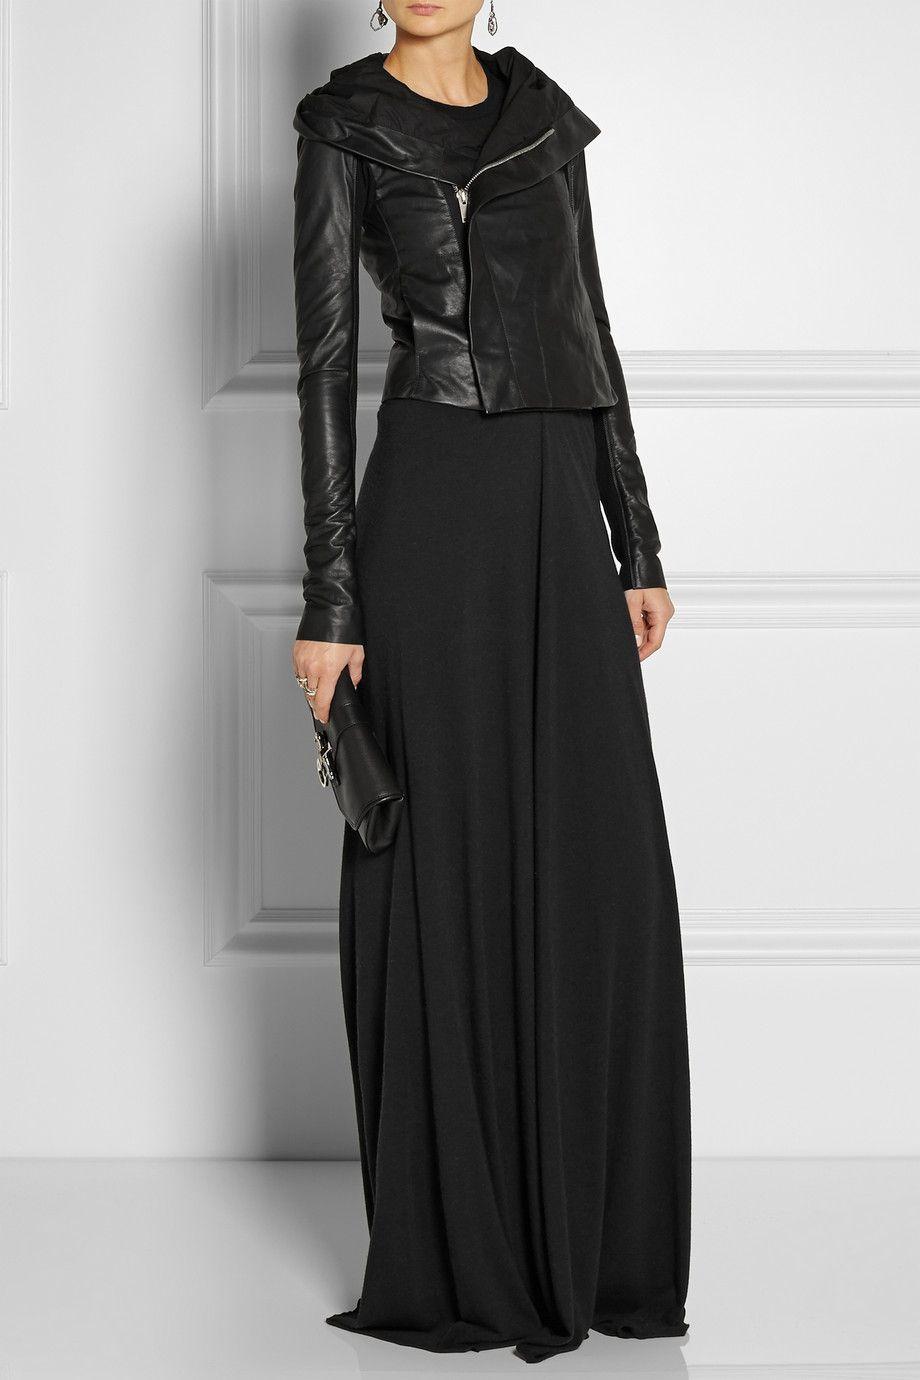 Rick owens leather long black skirt leather pinterest